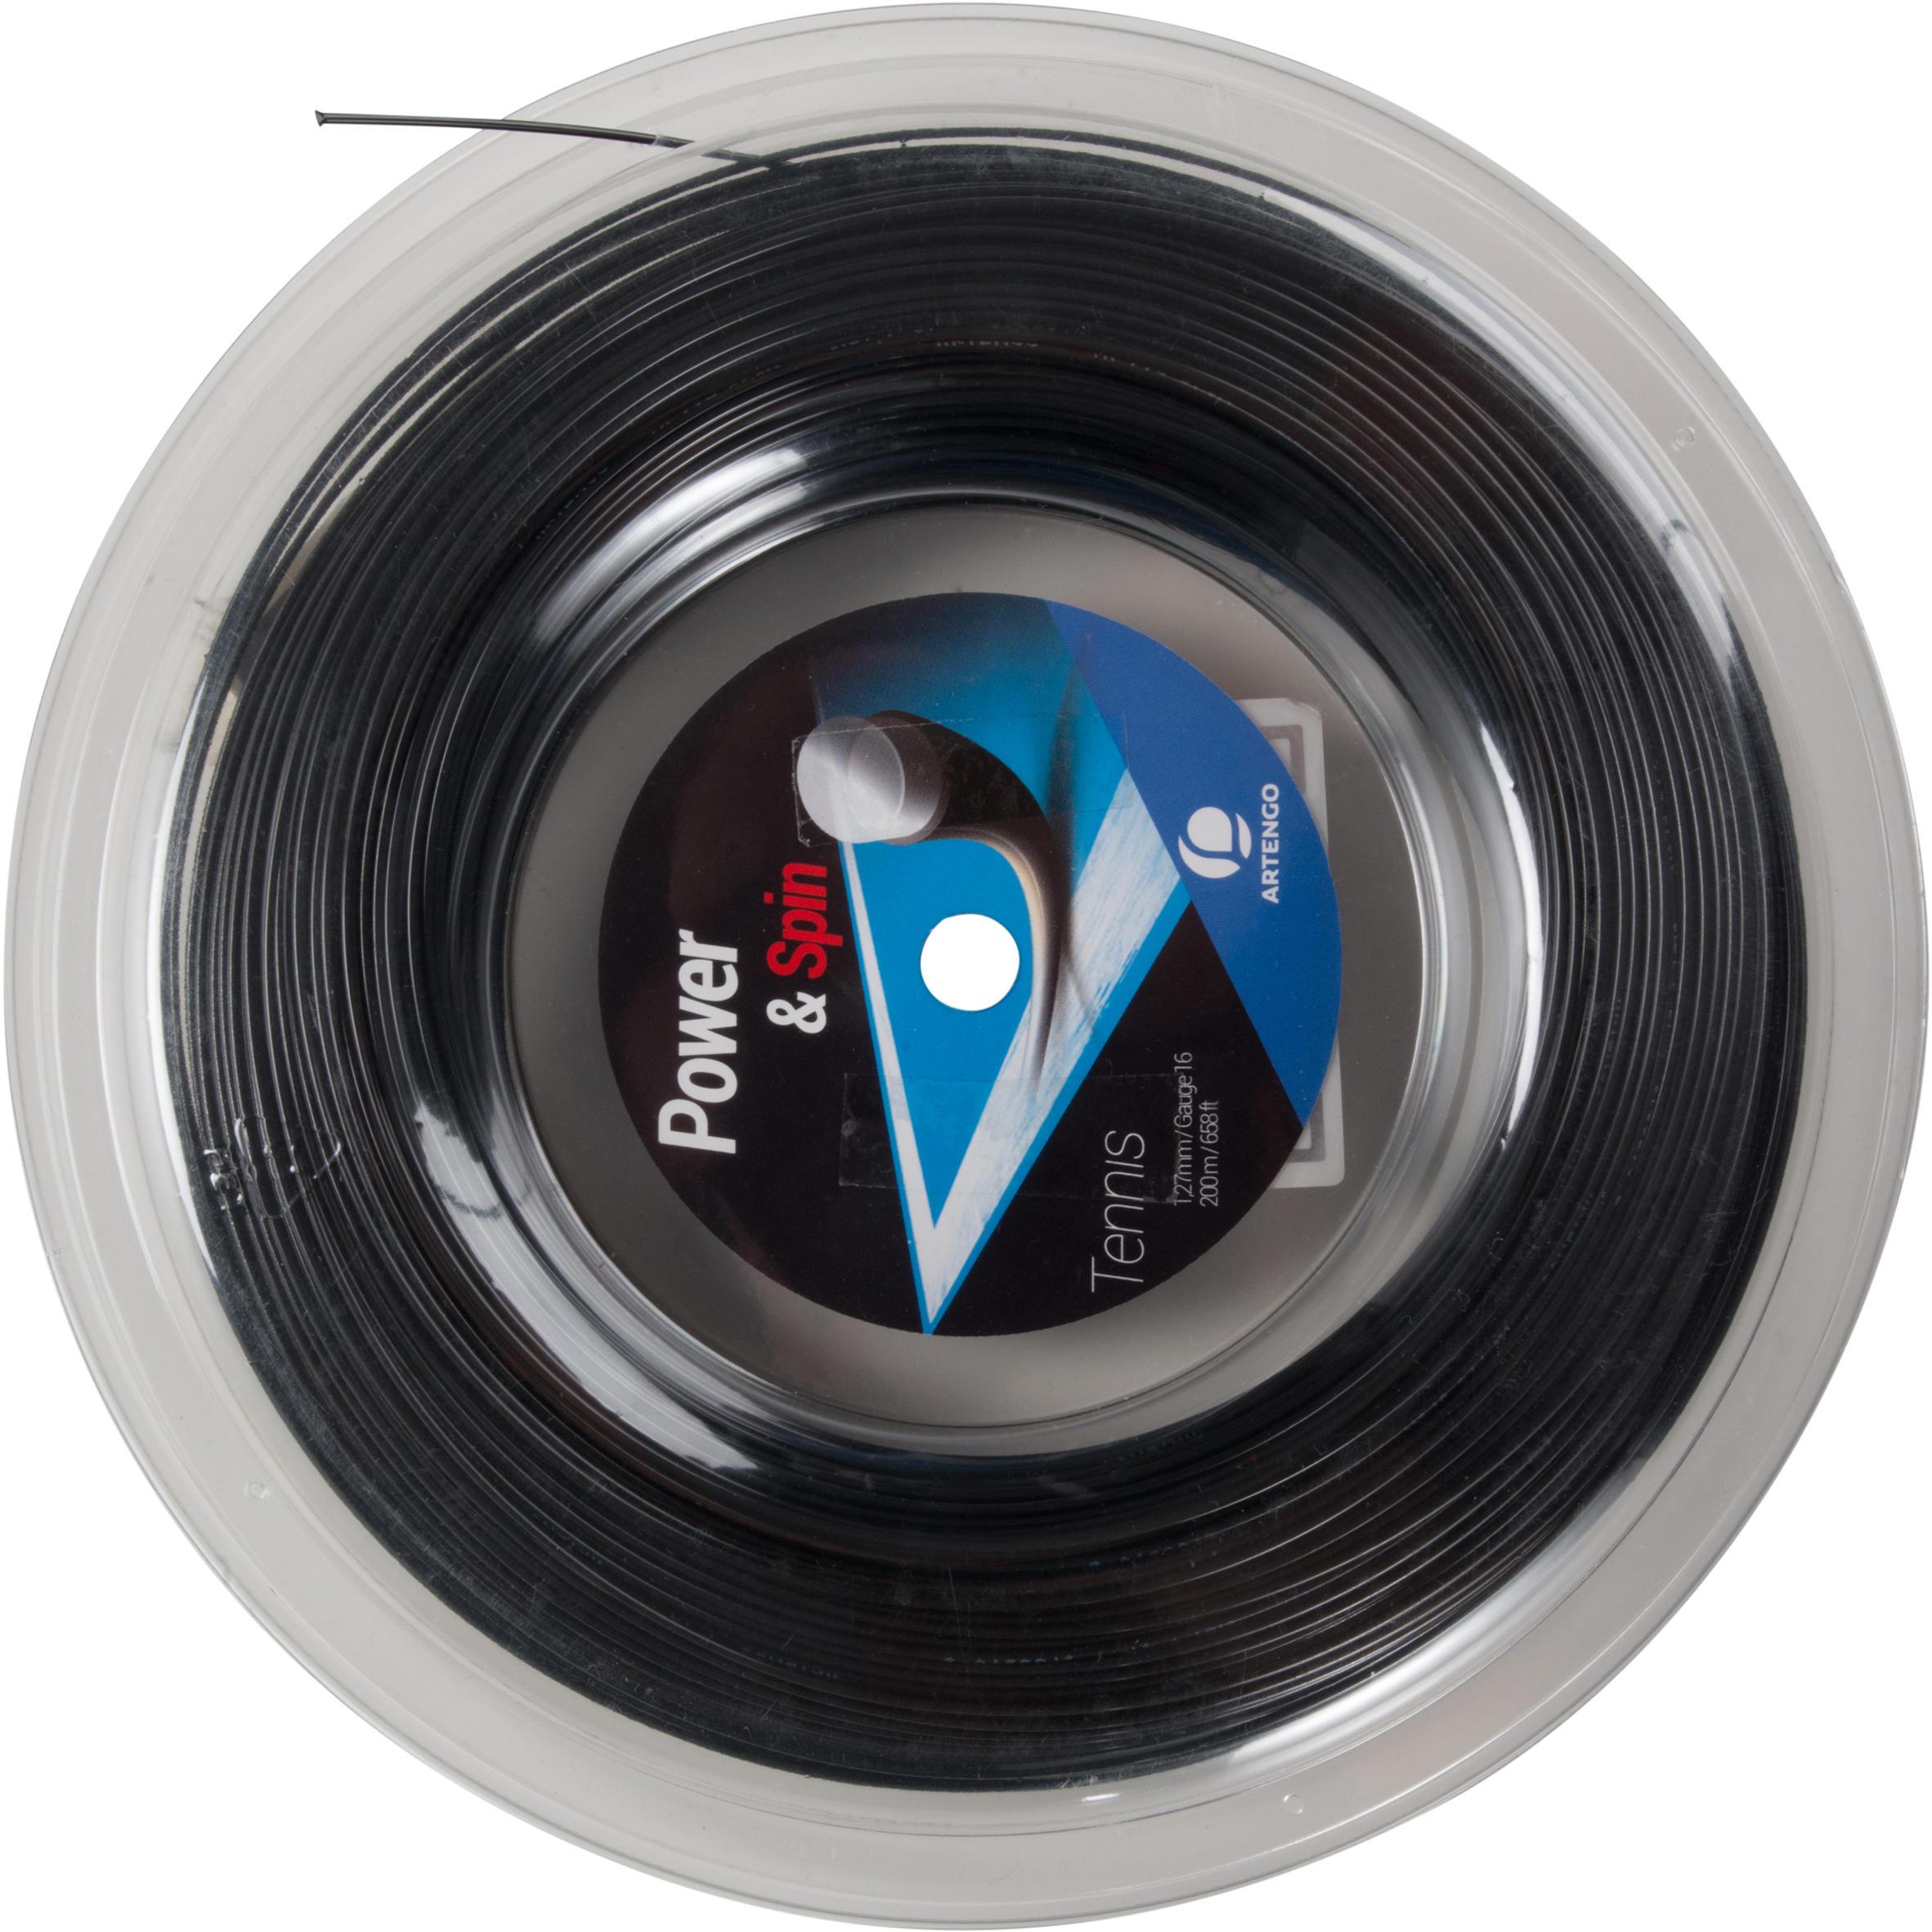 TA990 Spin 1.27 mm Monofilament Tennis String 200 m - Black